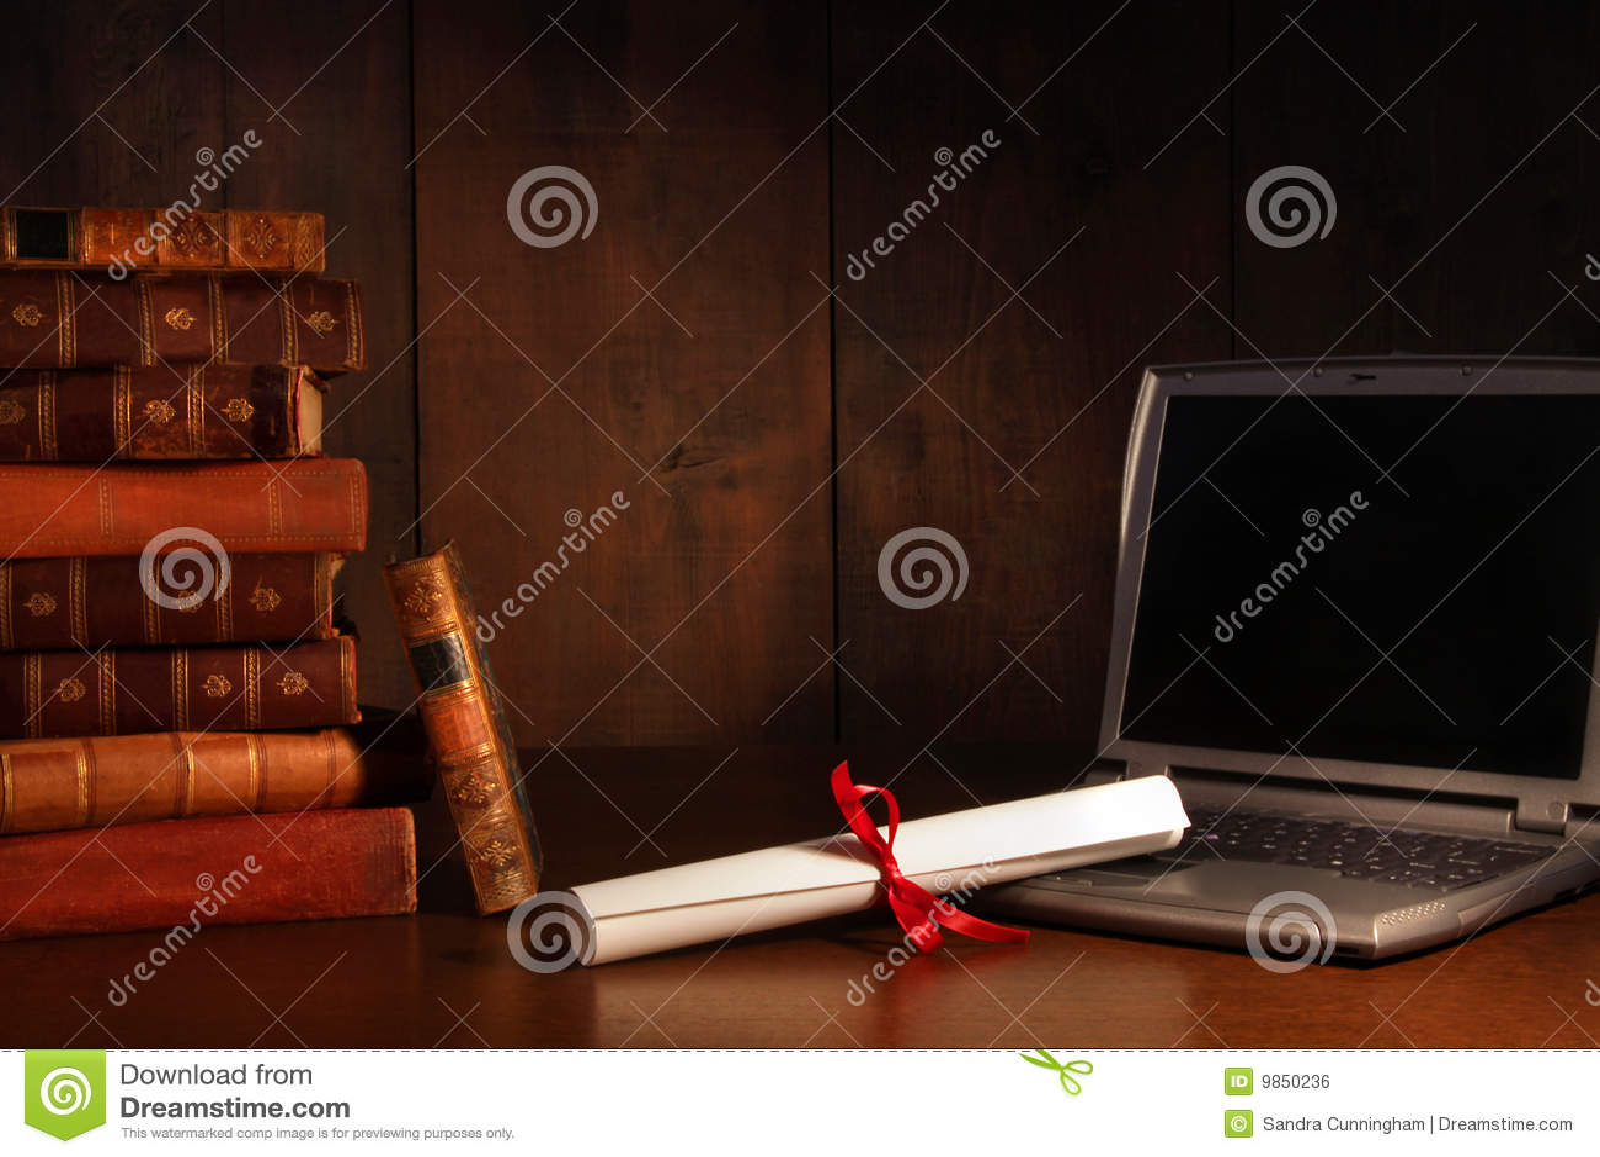 Antikviteten books skrivborddiplombärbar dator